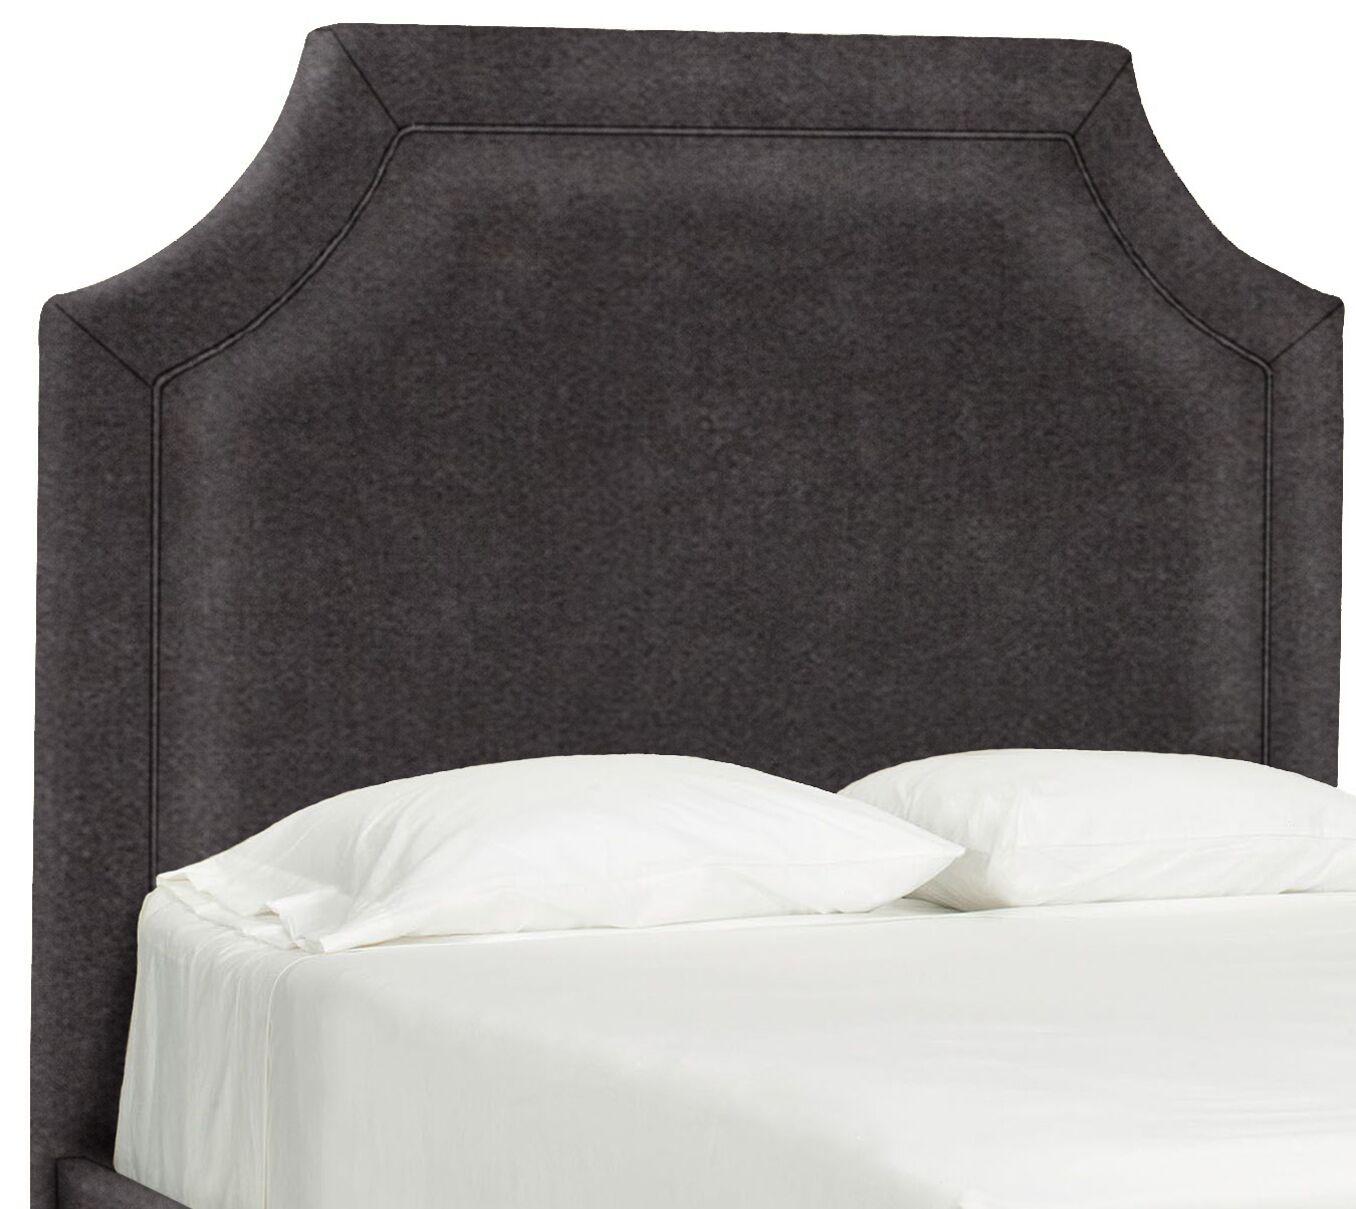 Dreamtime Upholstered Panel Headboard Size: Queen, Upholstery: Dark Ash